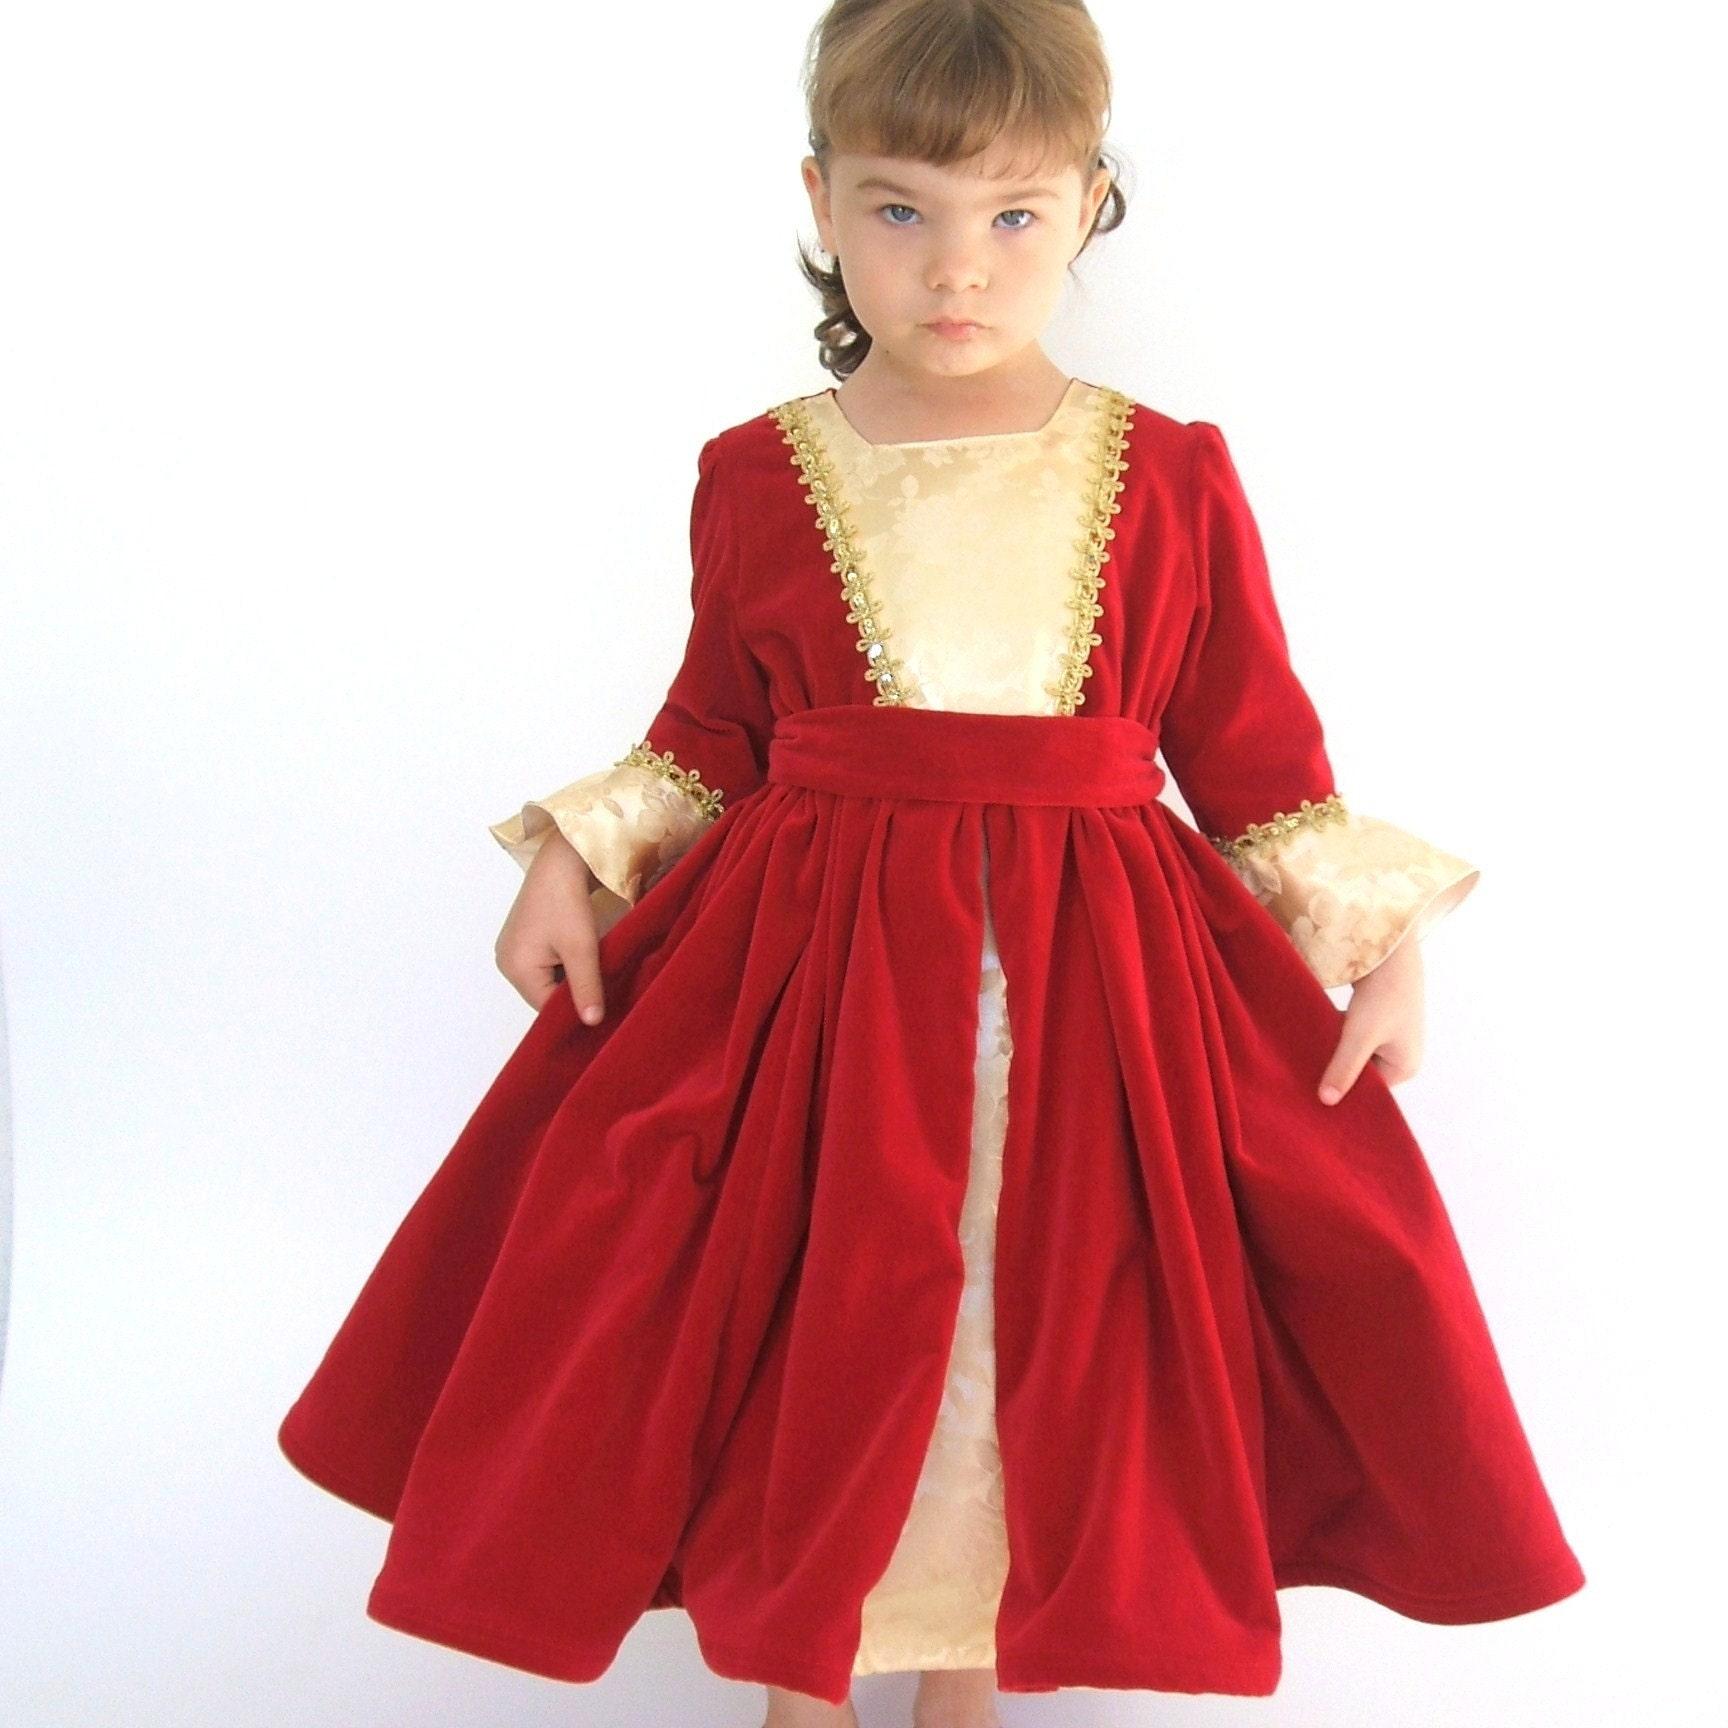 Beautiful Belle Christmas Dress Boutique Sample size 4/5